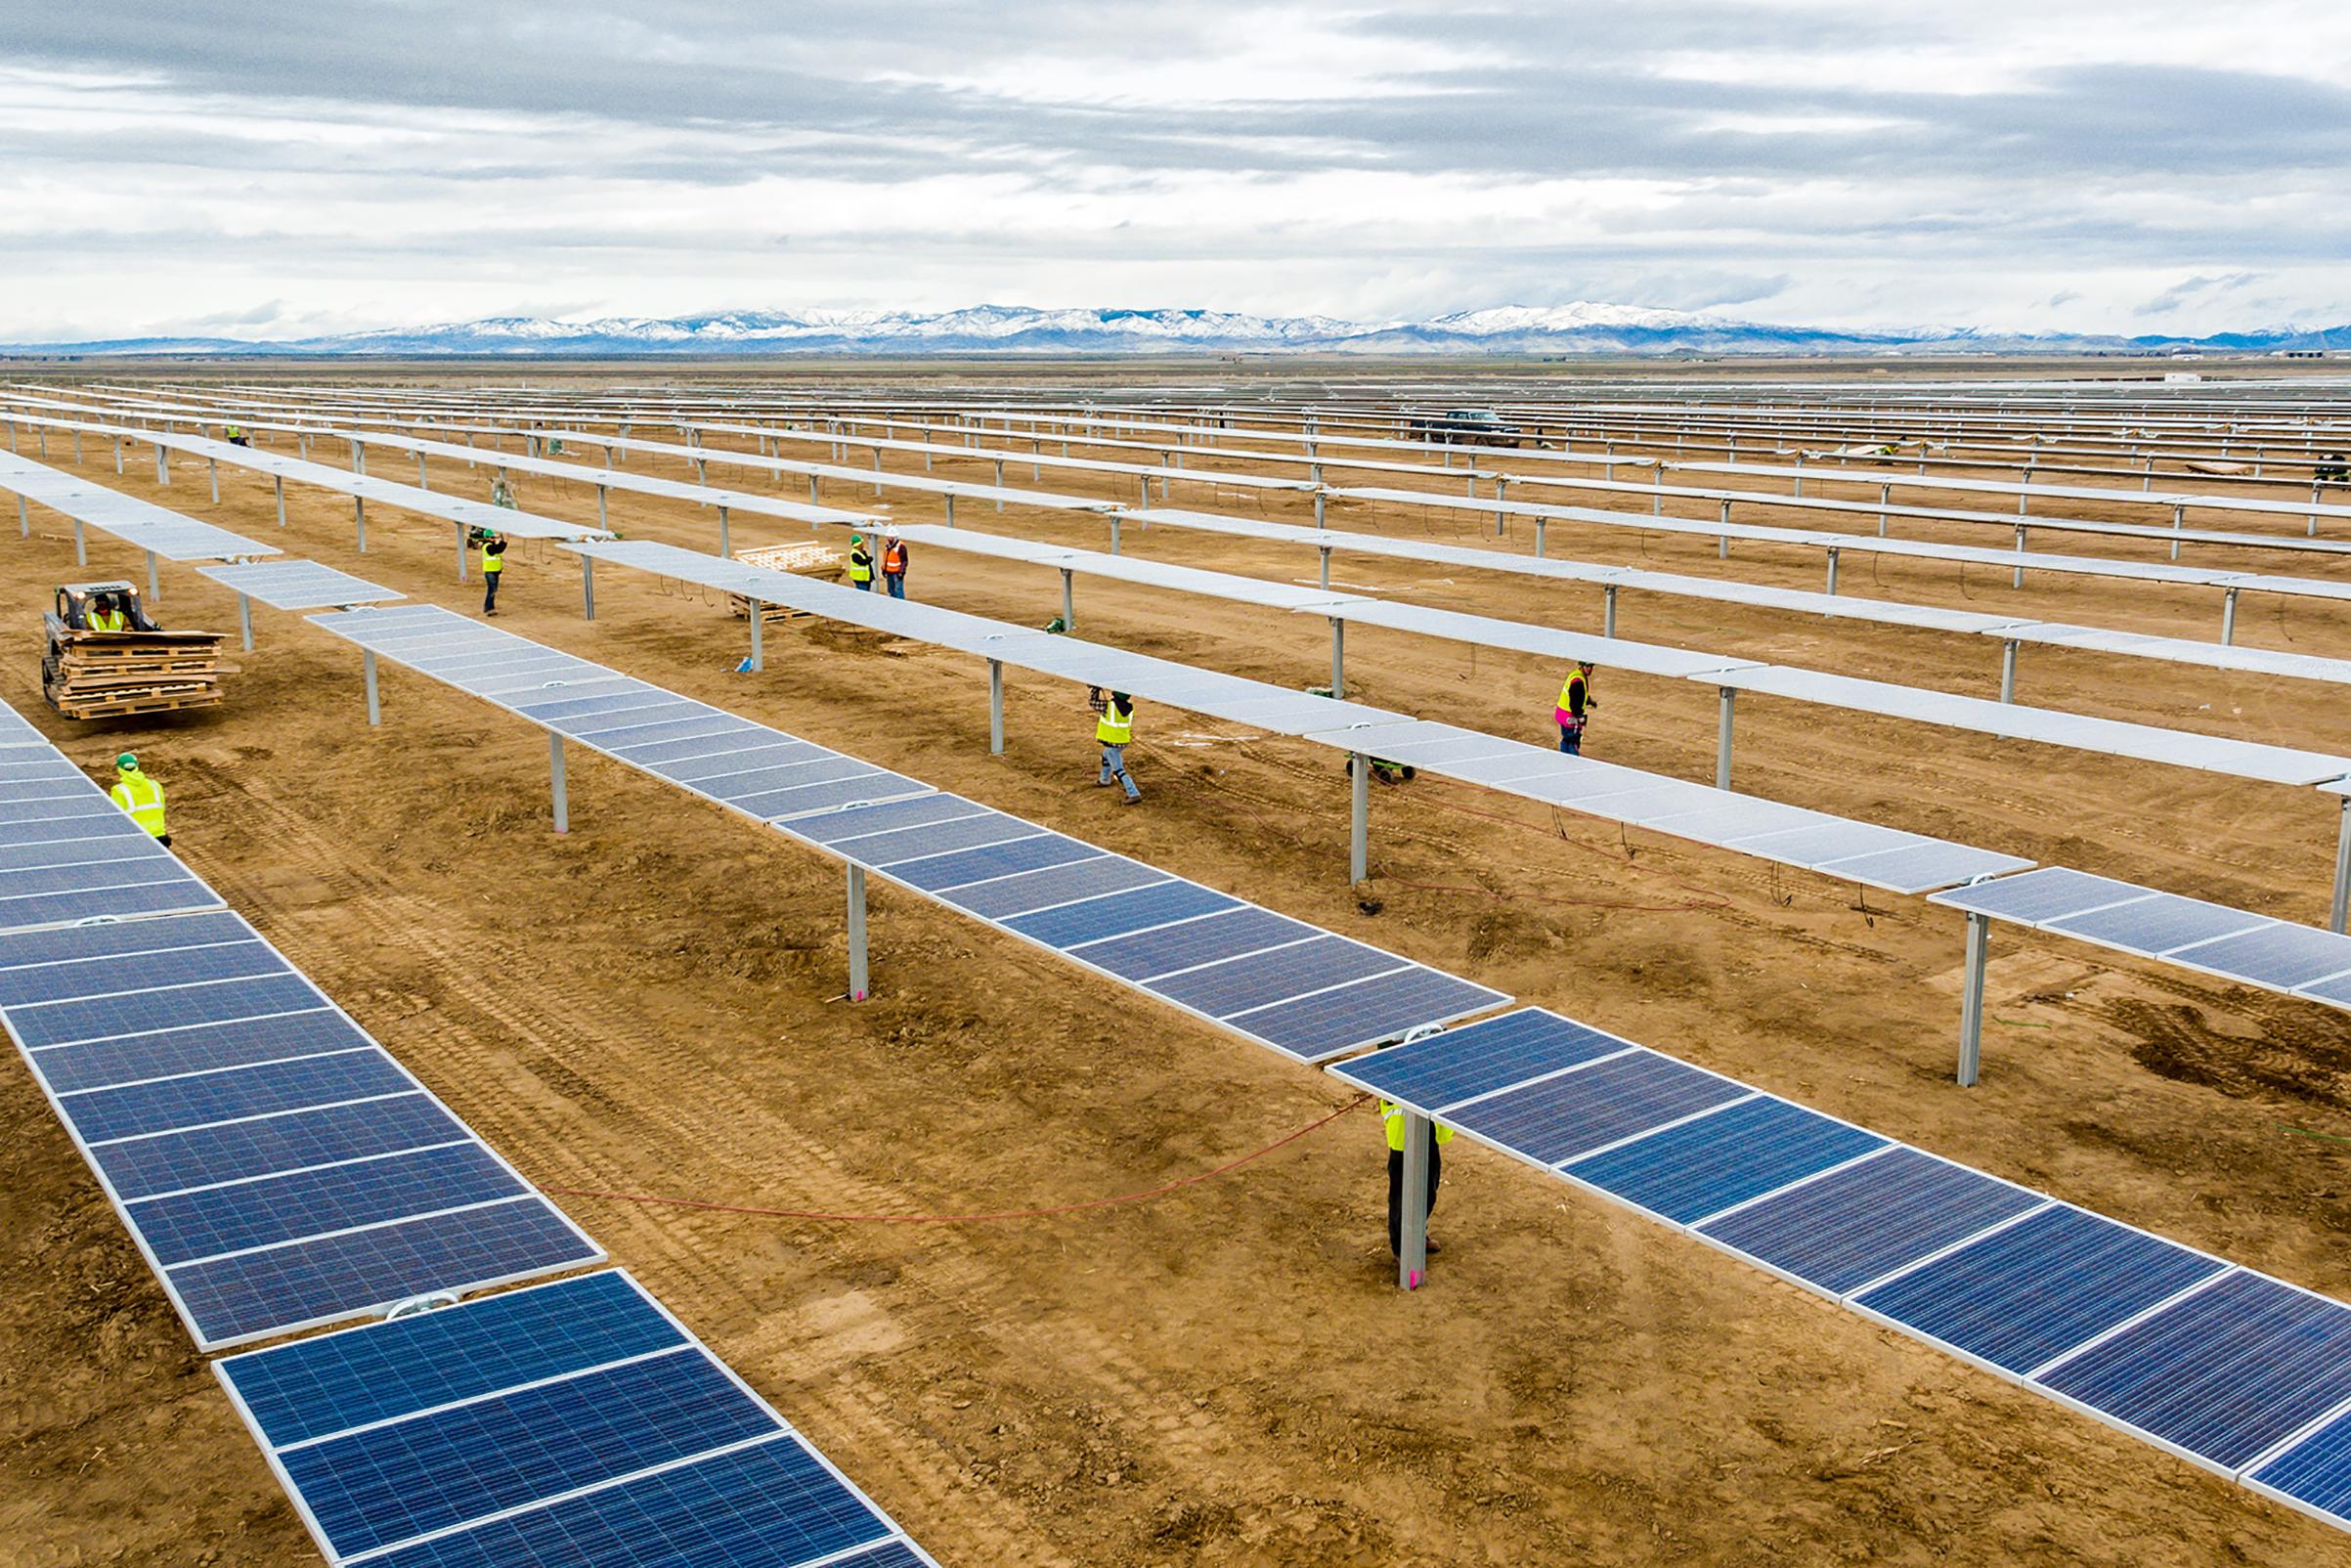 Construction crews assemble solar modules for a 55-megawatt power plant in Idaho built by DEPCOM